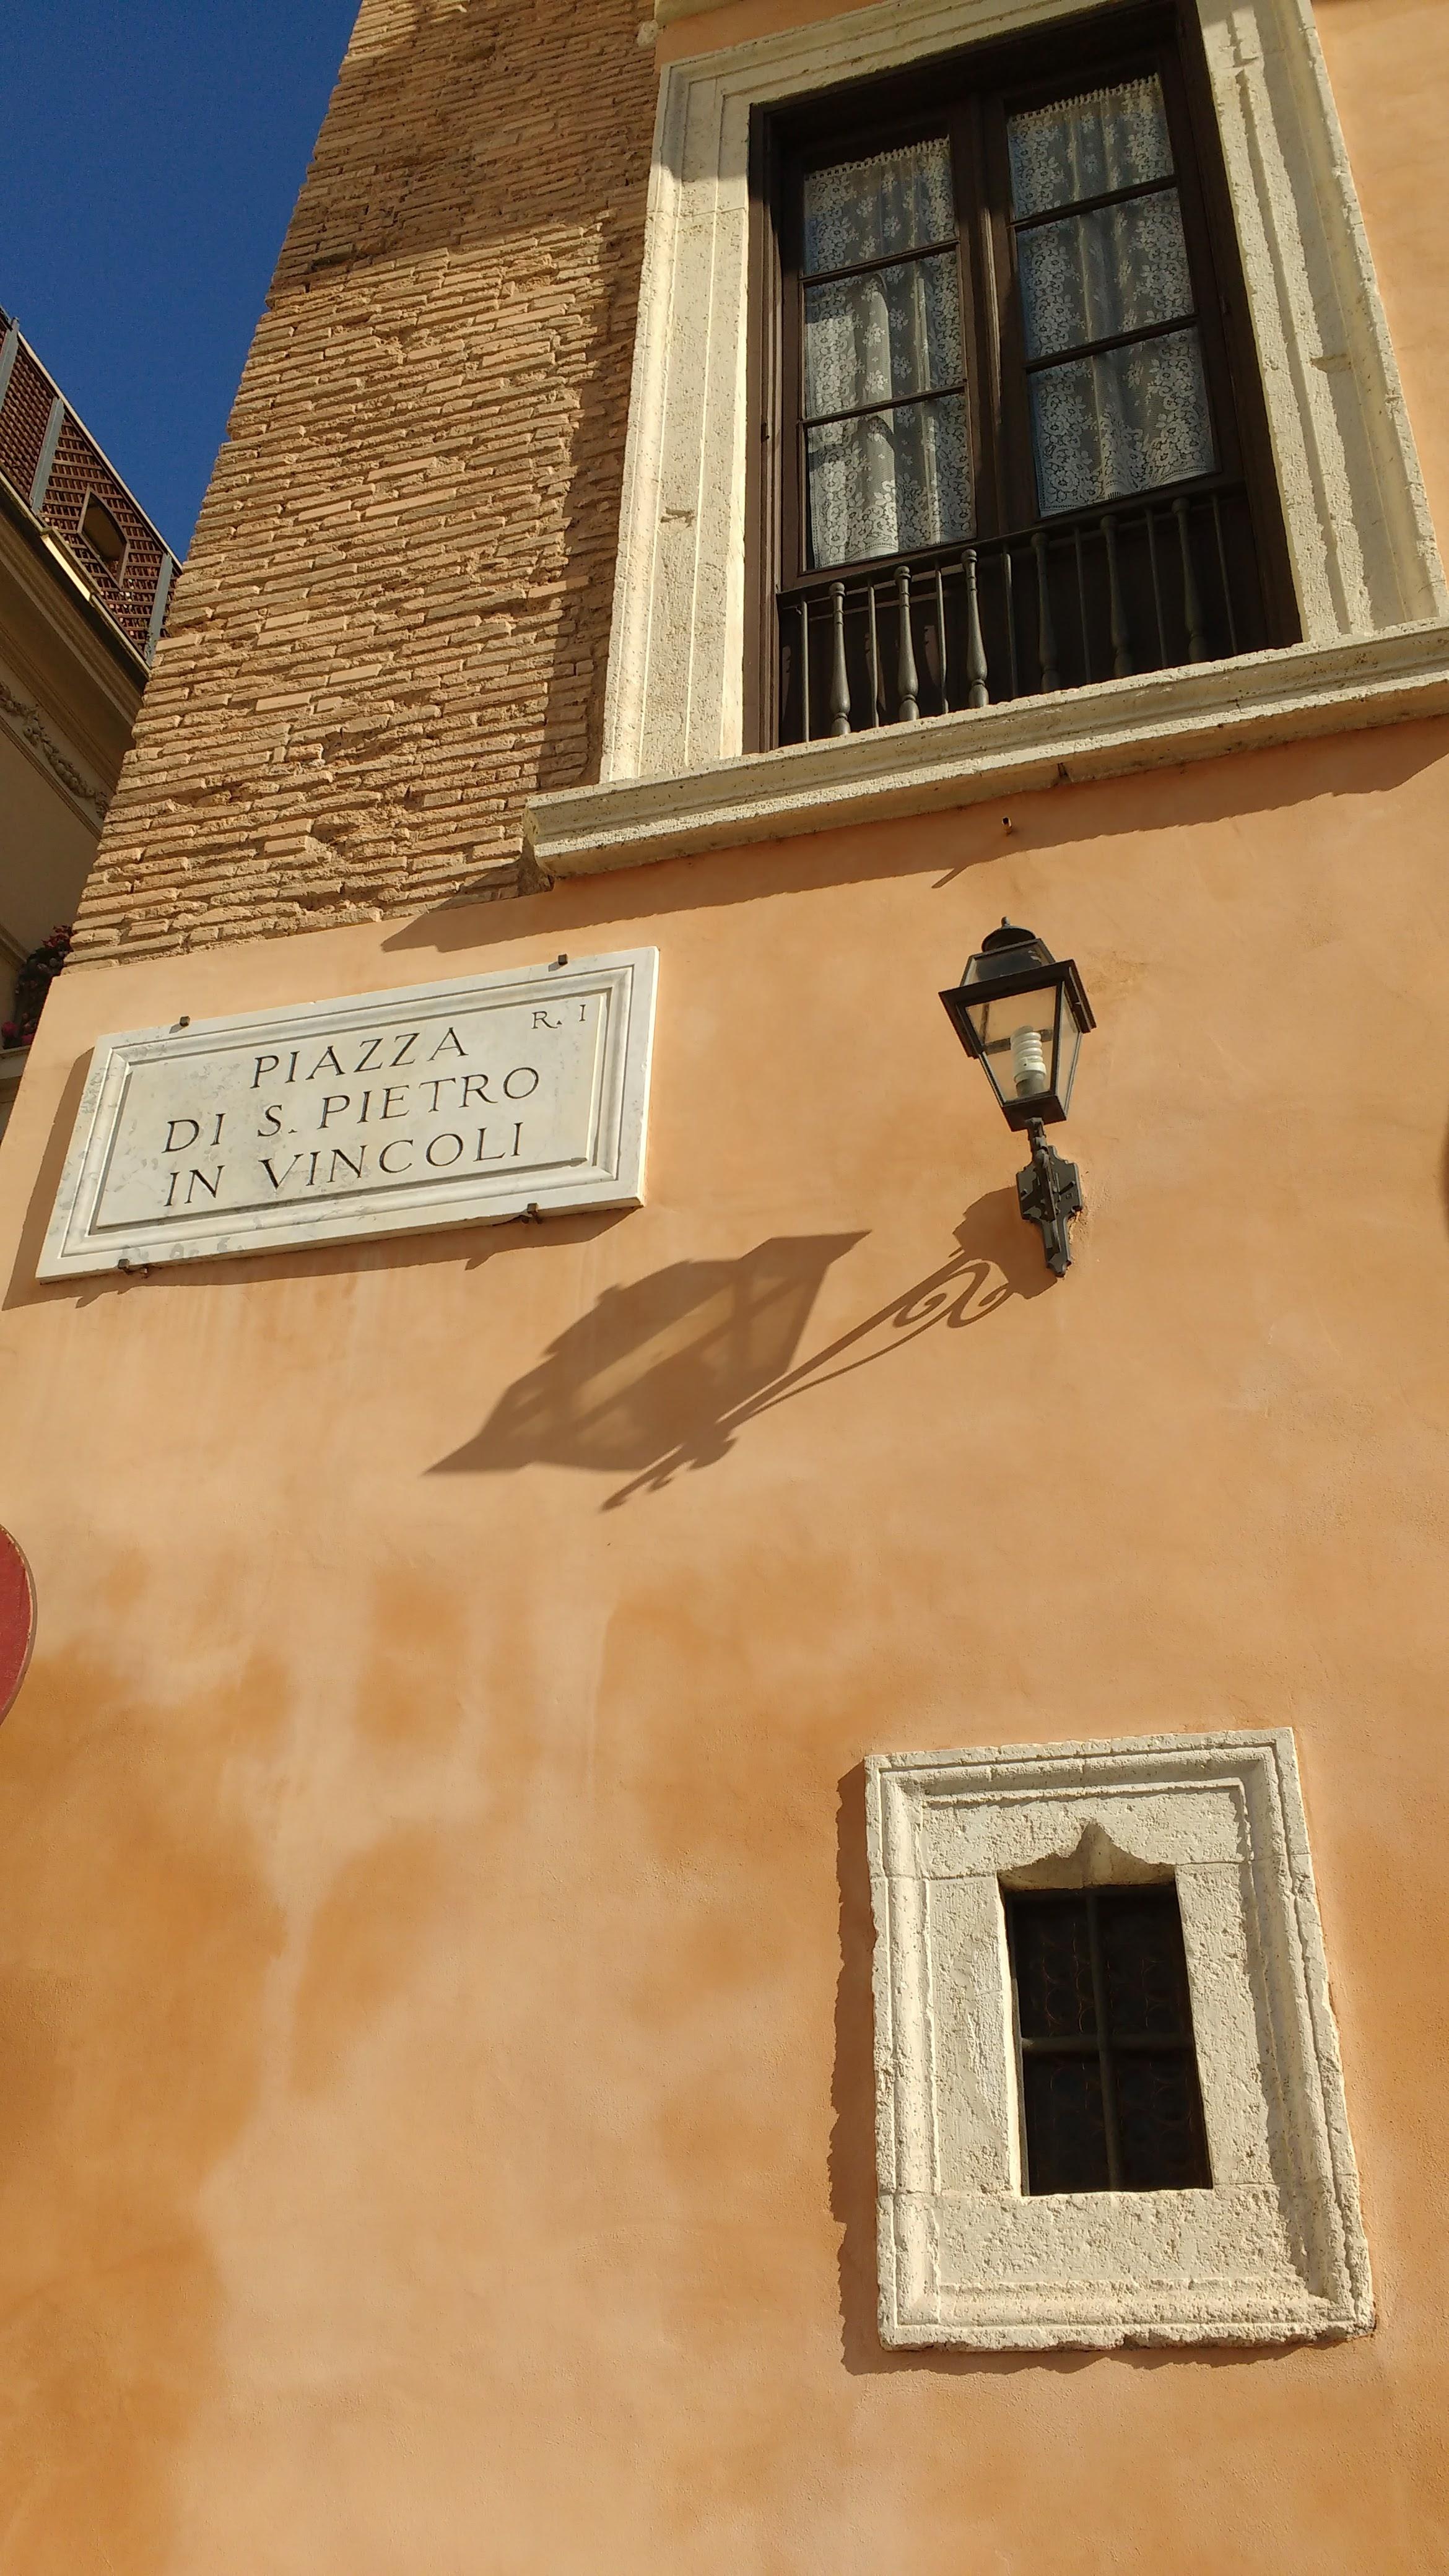 San Pietro in Vincoli - Moises de Miguel Angel